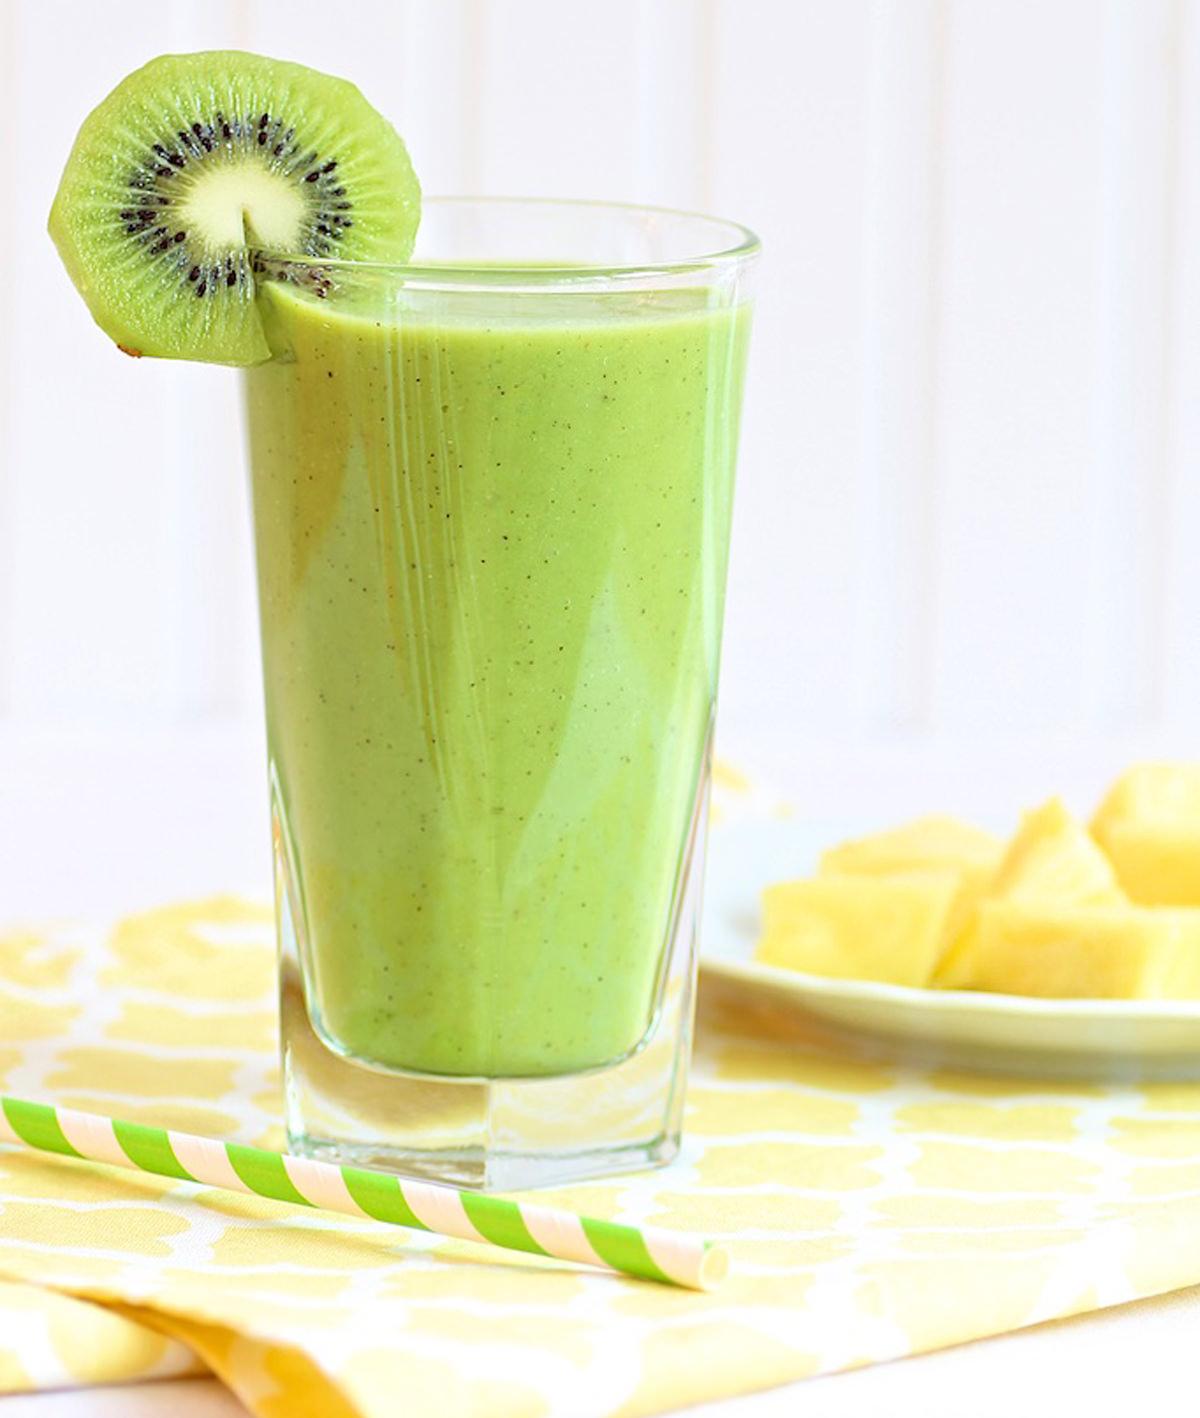 Pineapple-Kiwi-Vanilla-Yogurt-Smoothie